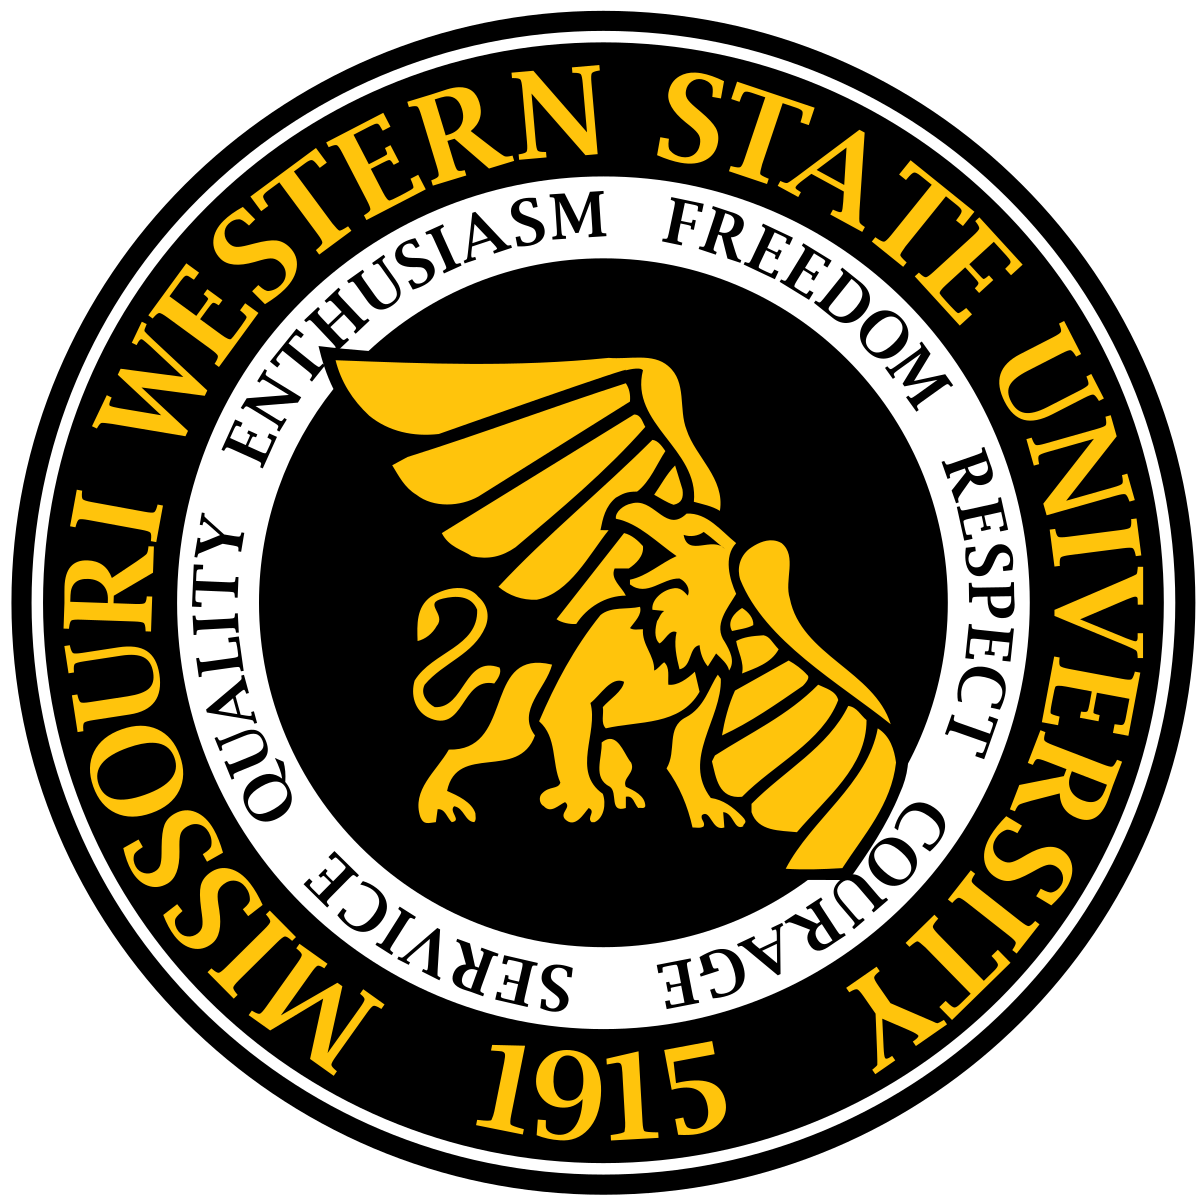 1200x1200 Missouri Western State University